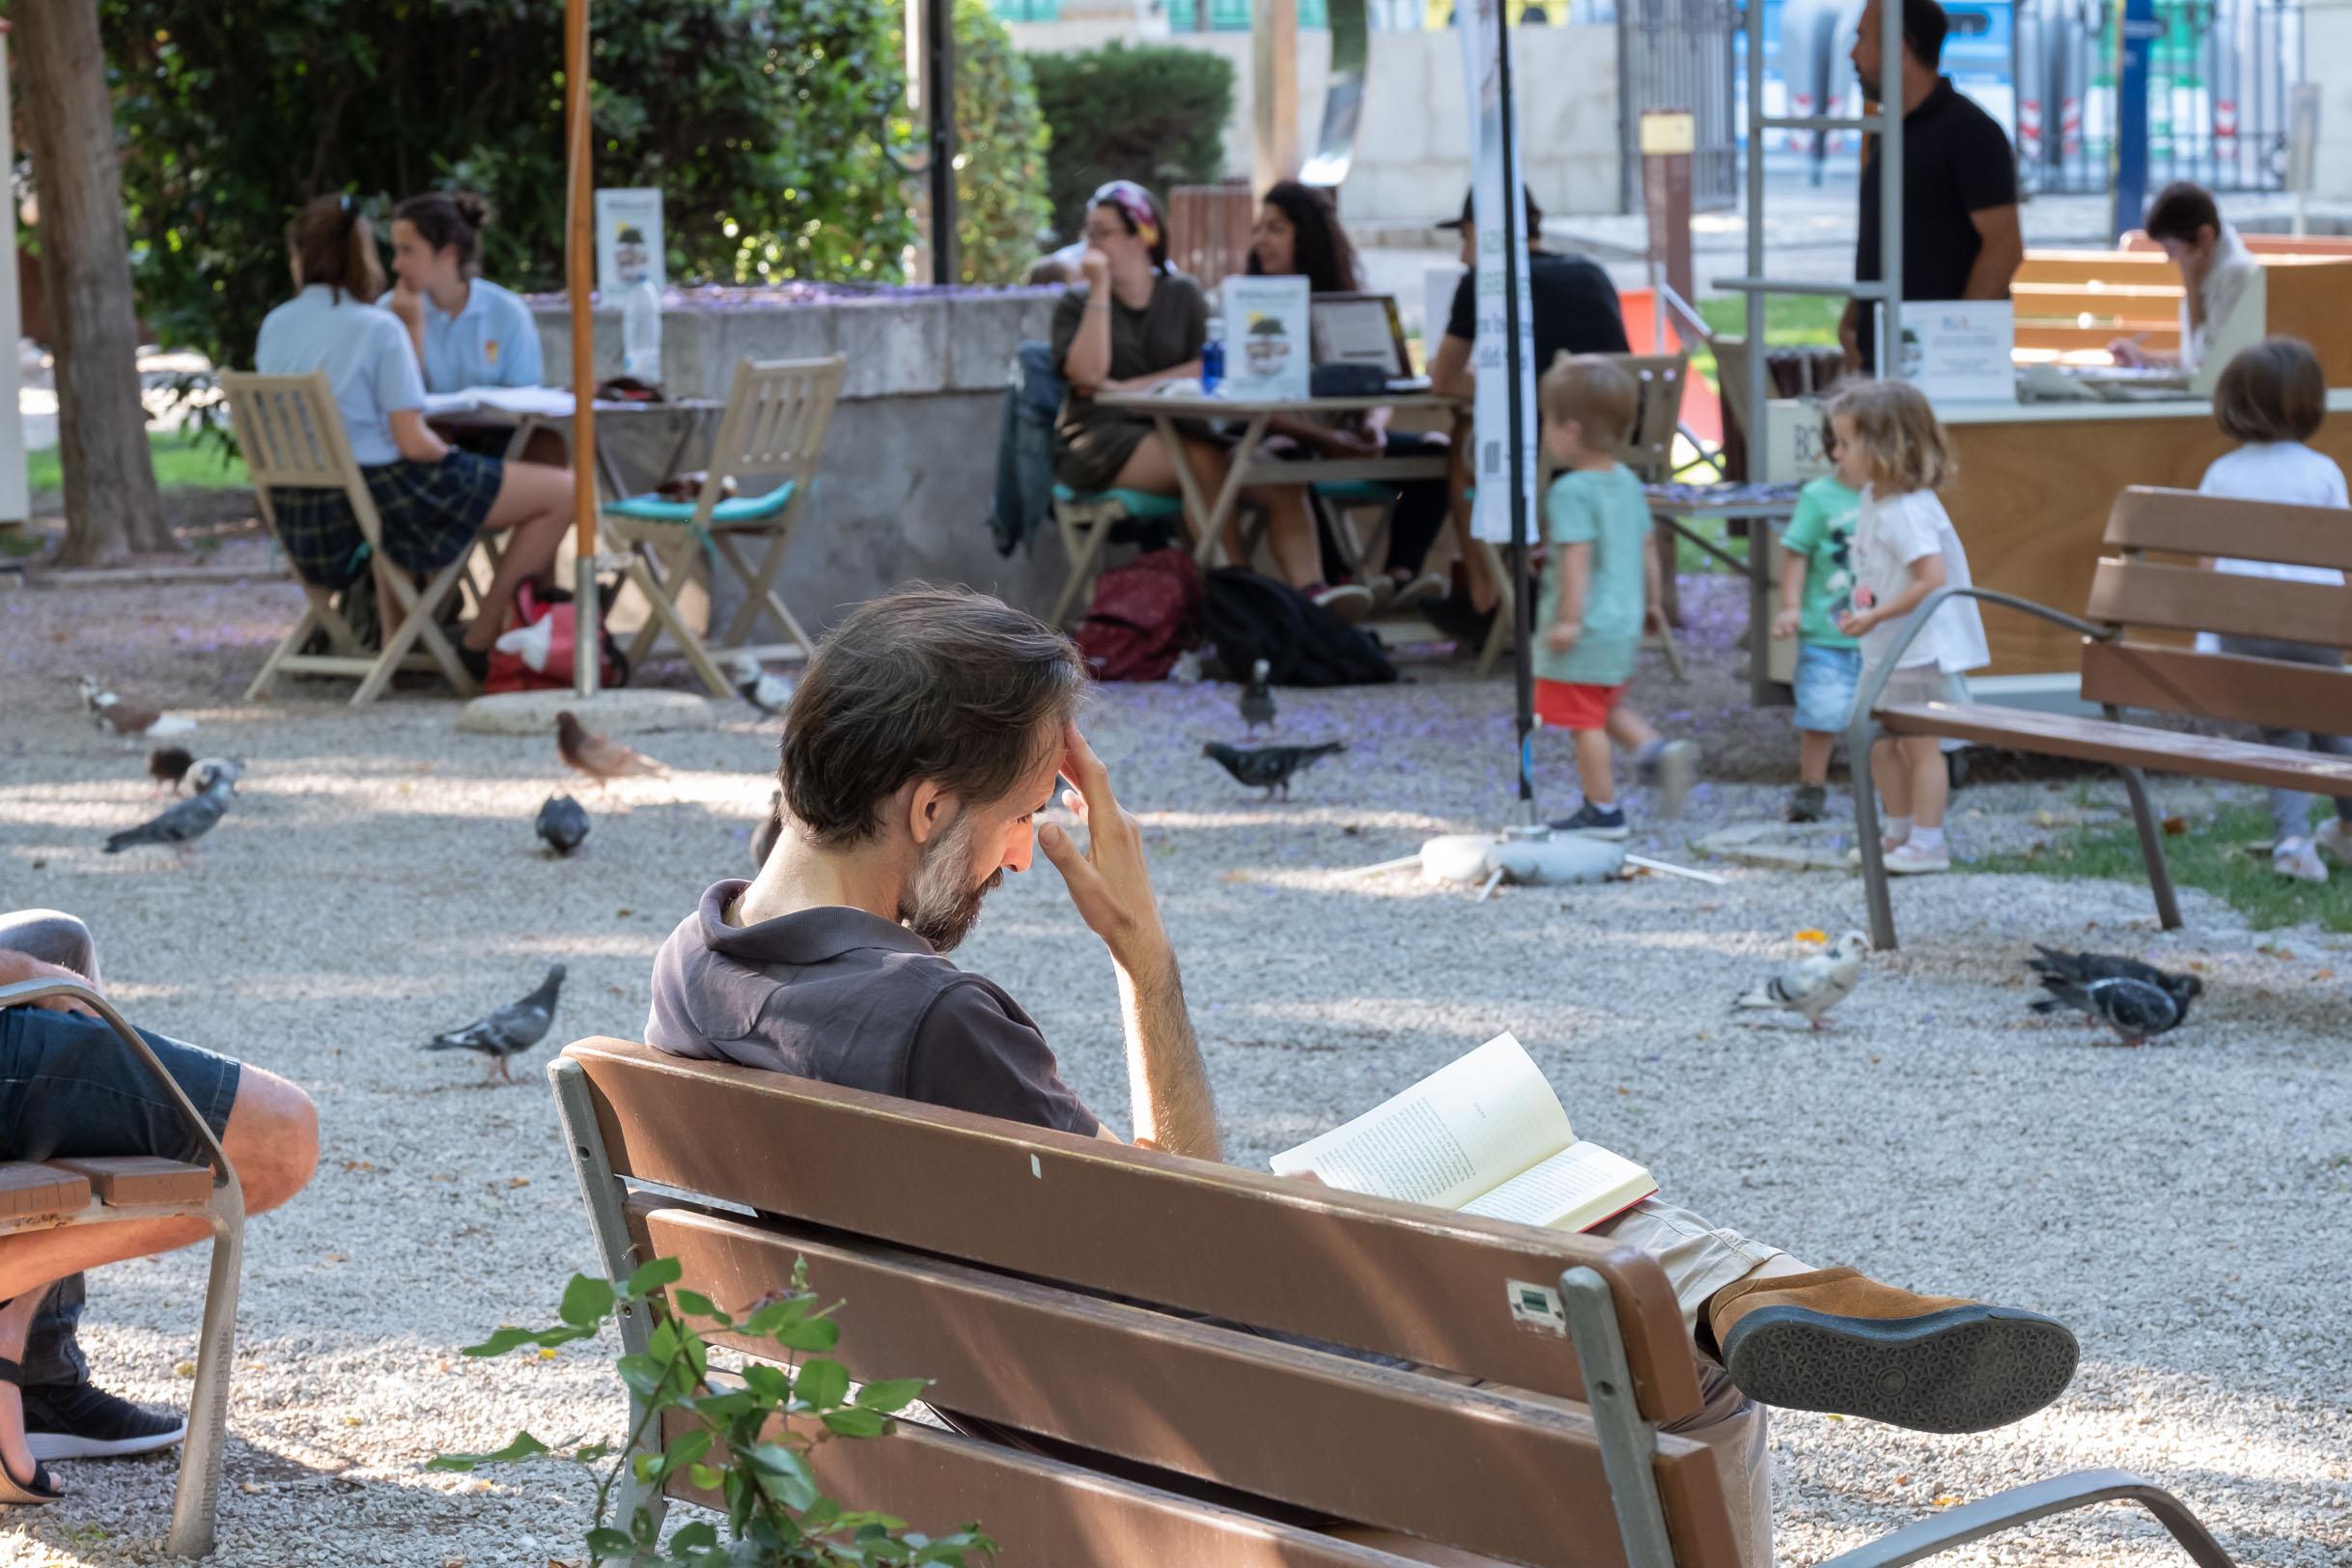 Reading oasis: BiblioJardí opens again - Estilo Palma